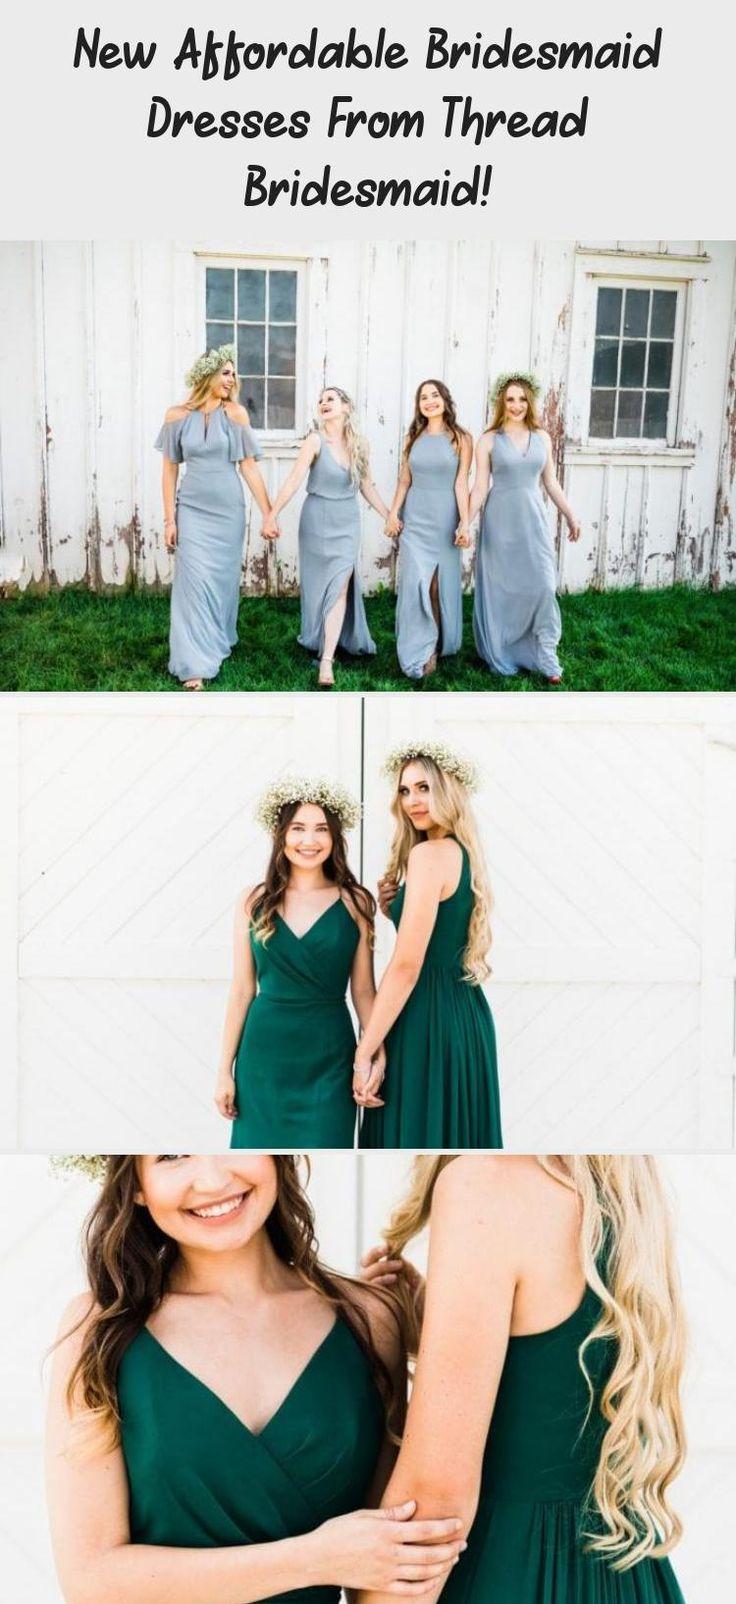 Light blue boho style affordable dresses for bridesmaids from Thread Bridesmaid! #bridesmaids #bridesmaid #bridesmaiddresses #BridesmaidDressesCoral #BridesmaidDresses2019 #TaupeBridesmaidDresses #PlumBridesmaidDresses #RusticBridesmaidDresses